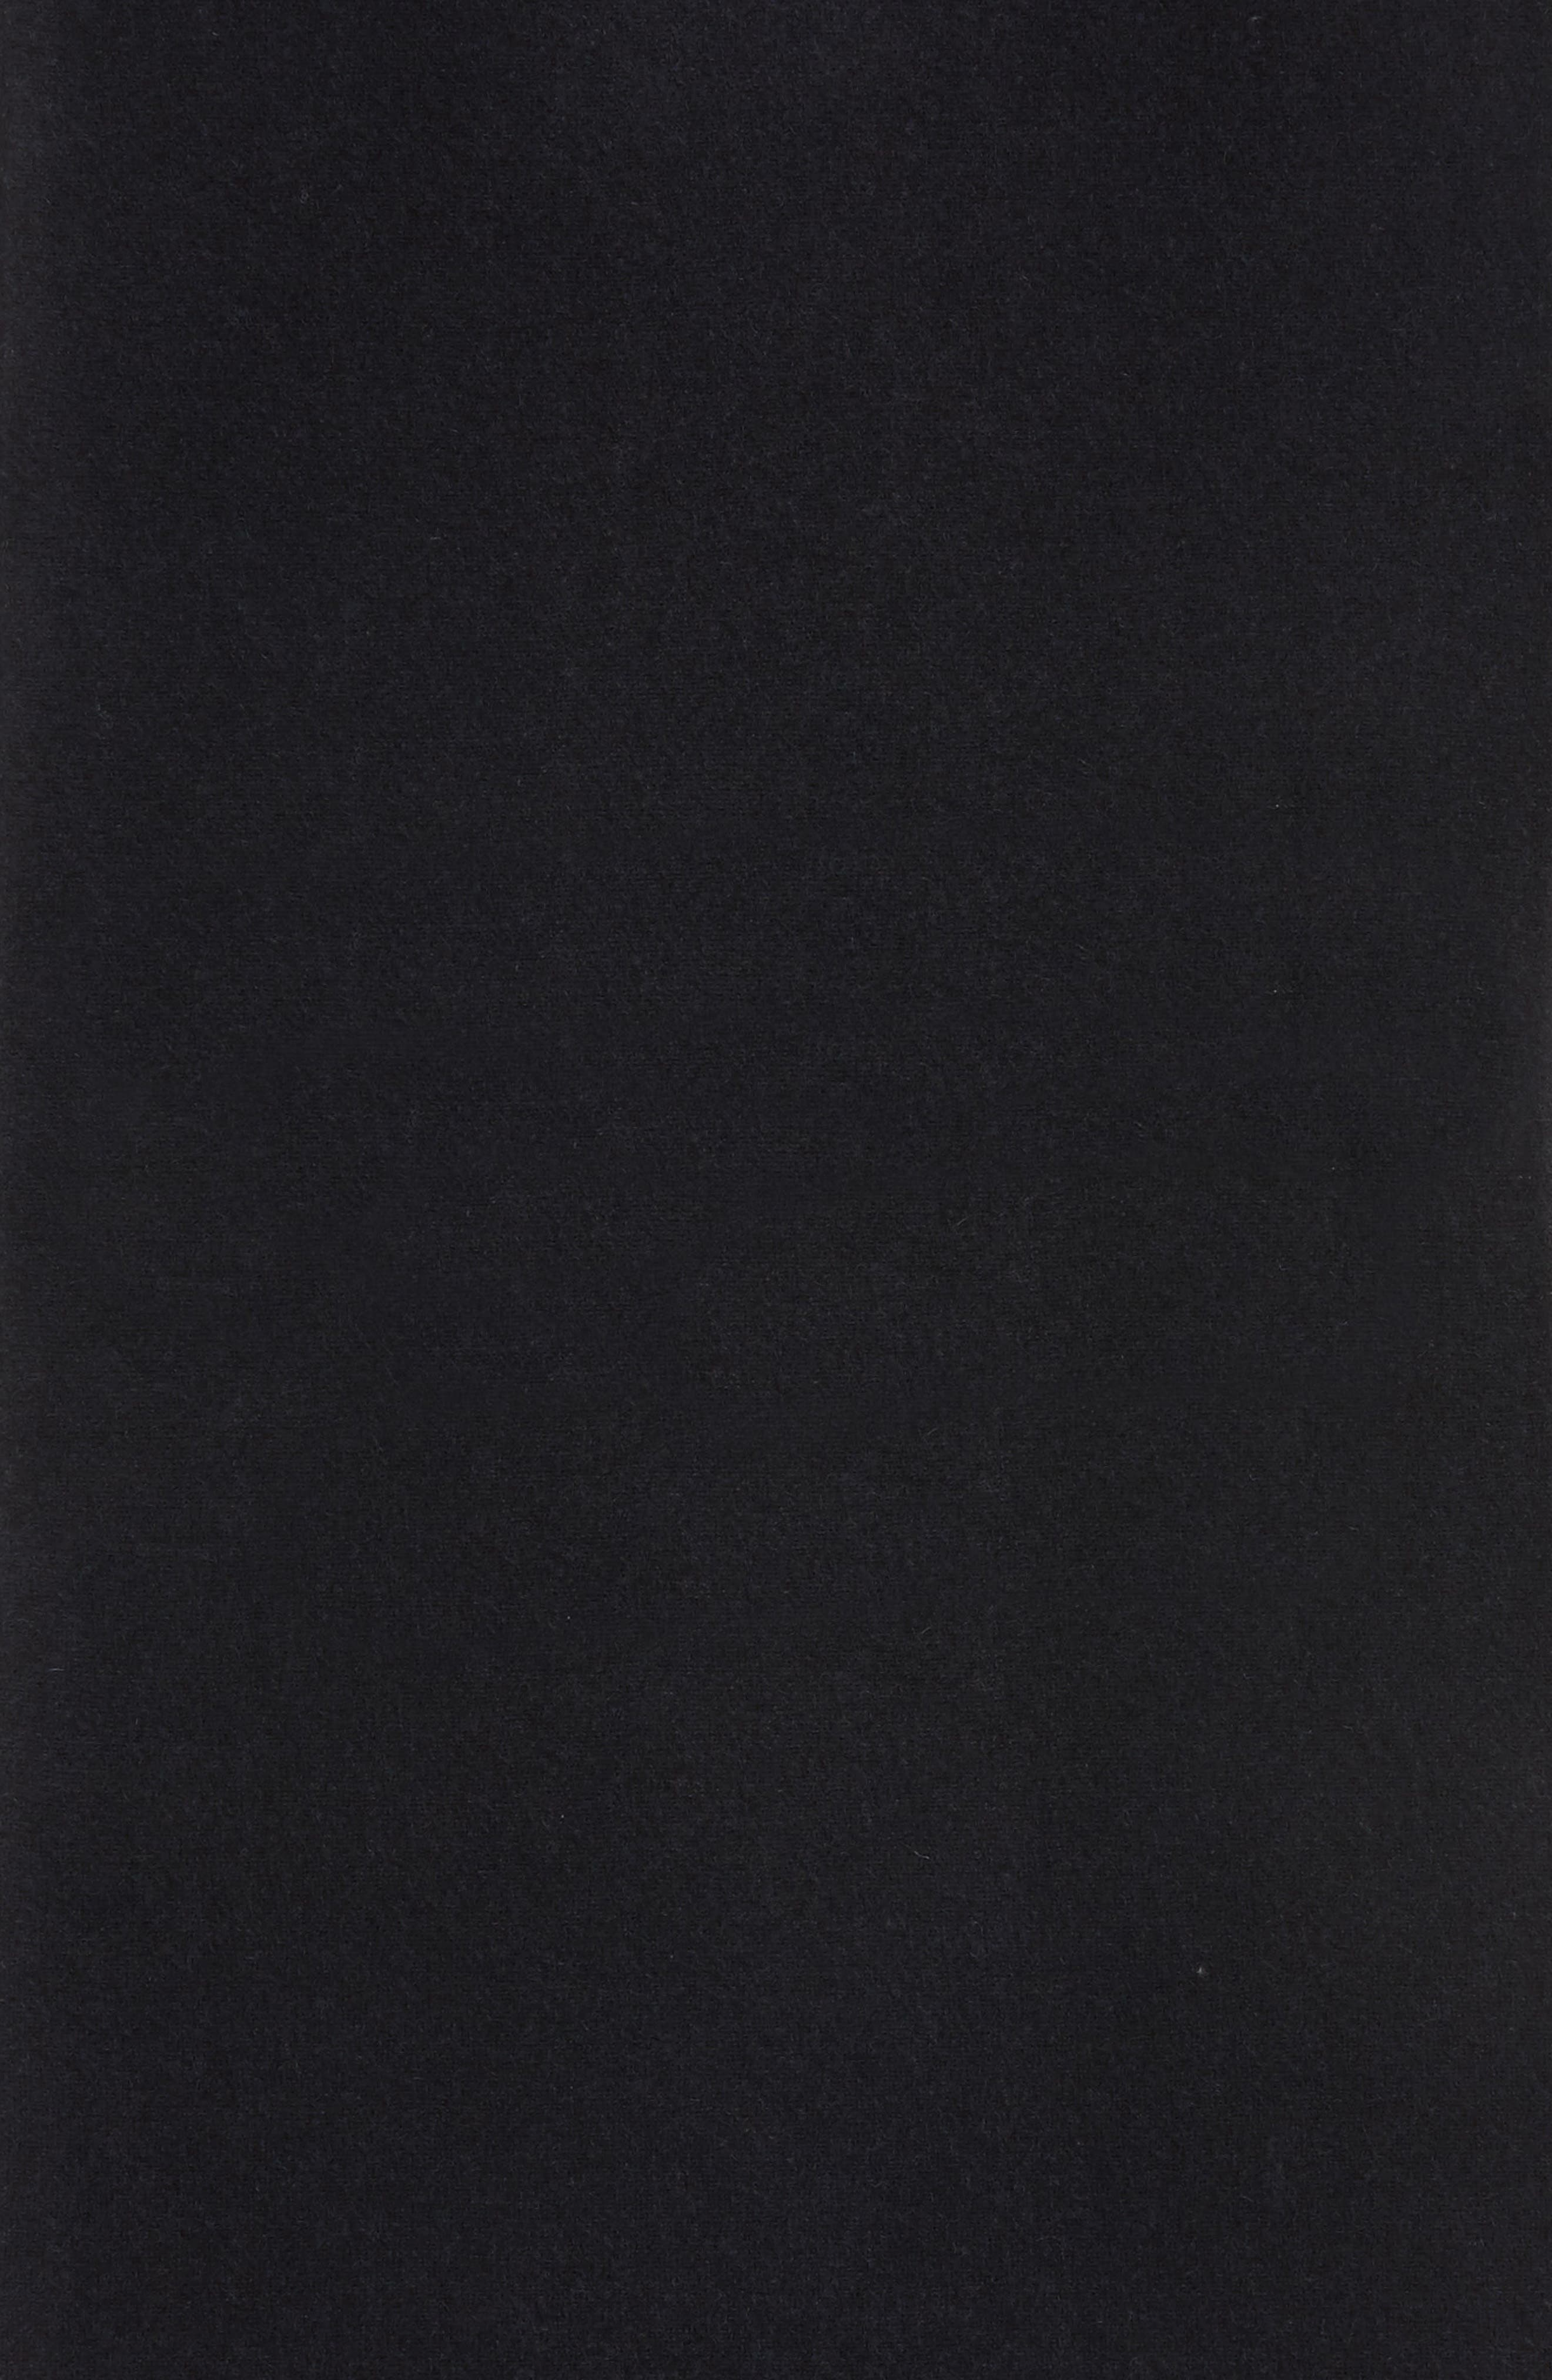 Cashmere Scarf,                             Alternate thumbnail 6, color,                             Black